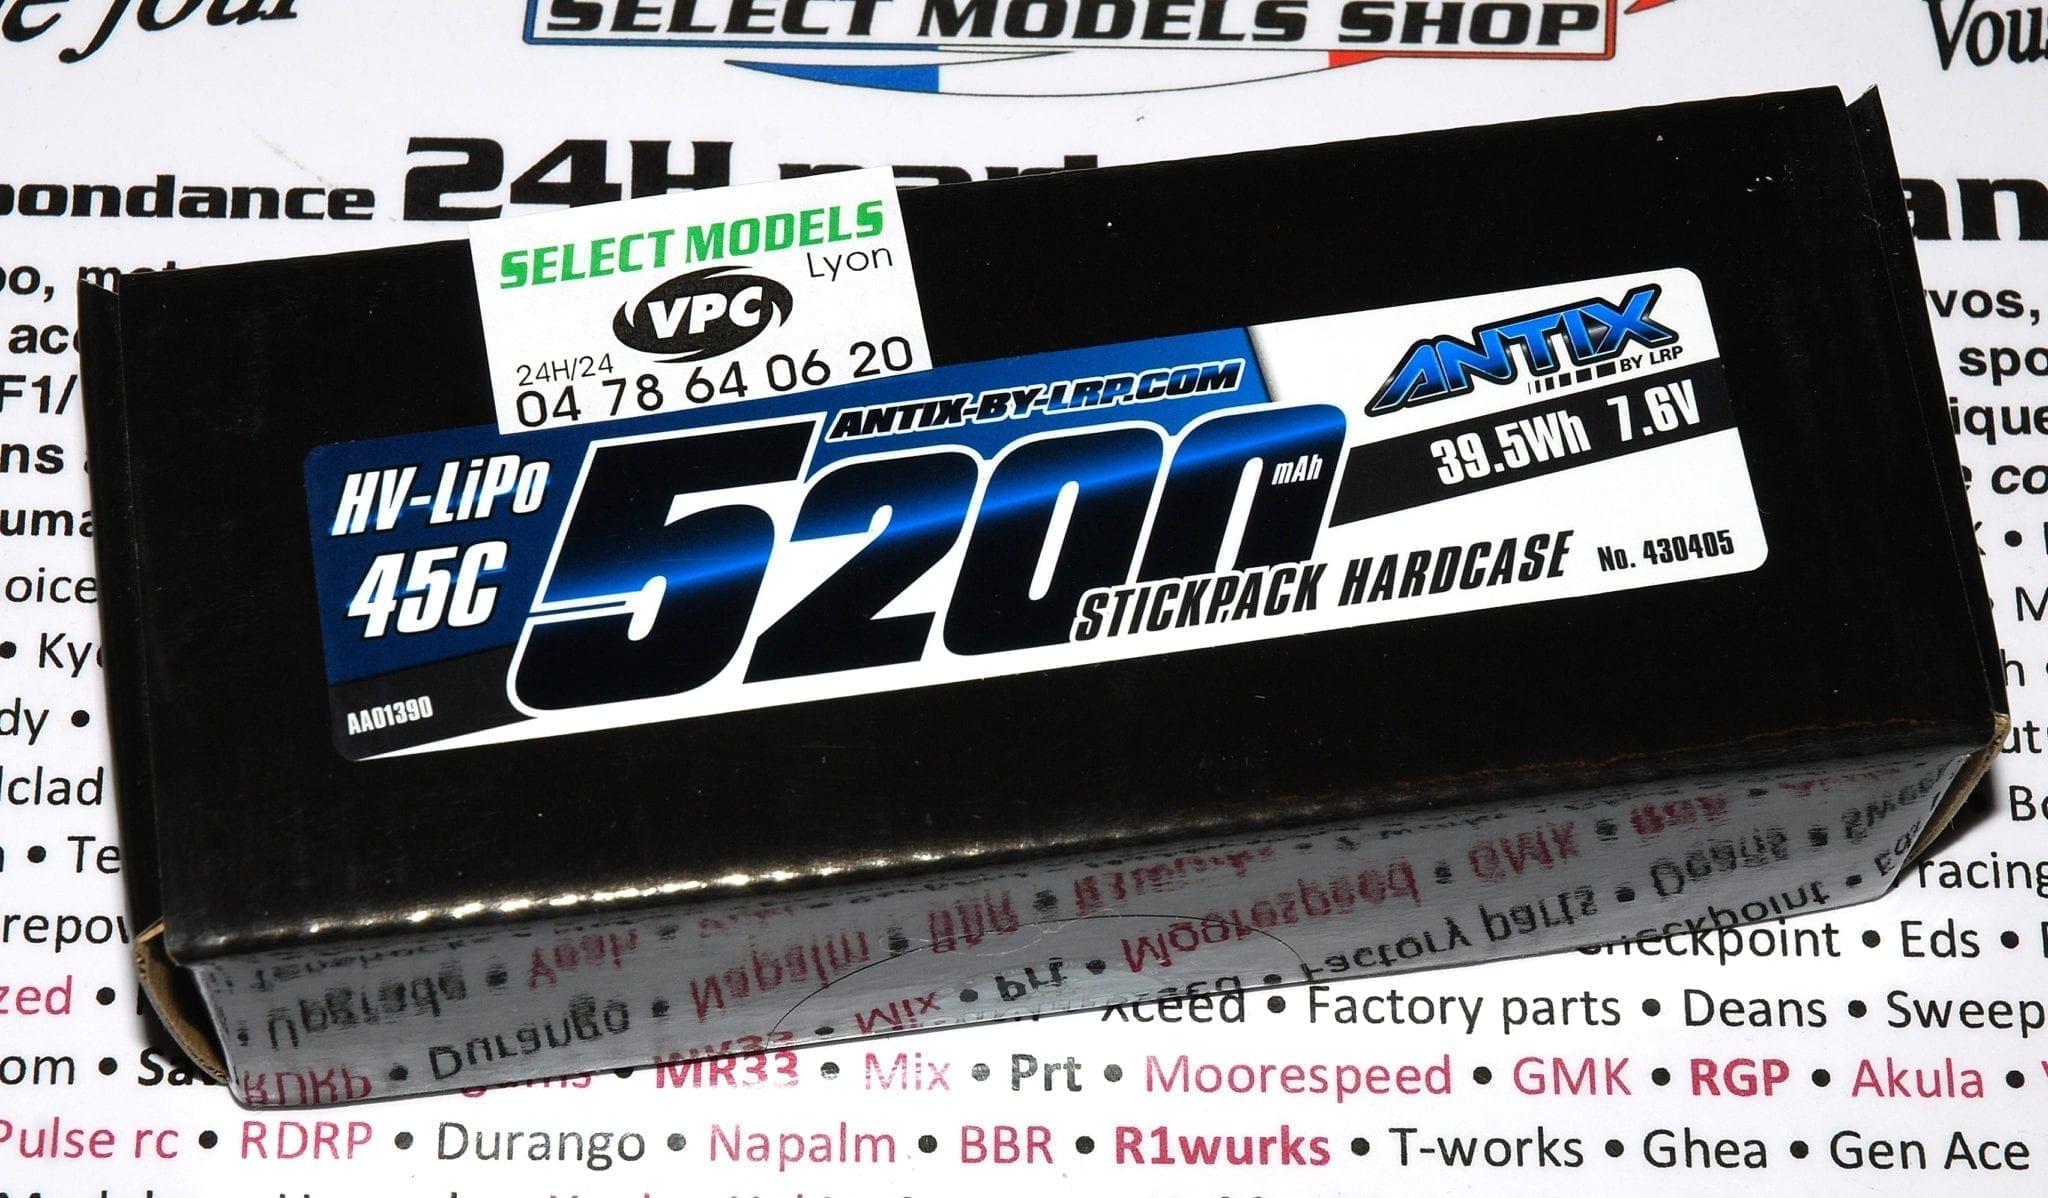 Pack stick lipo loisir Antix 5200 45c 7.6v hv